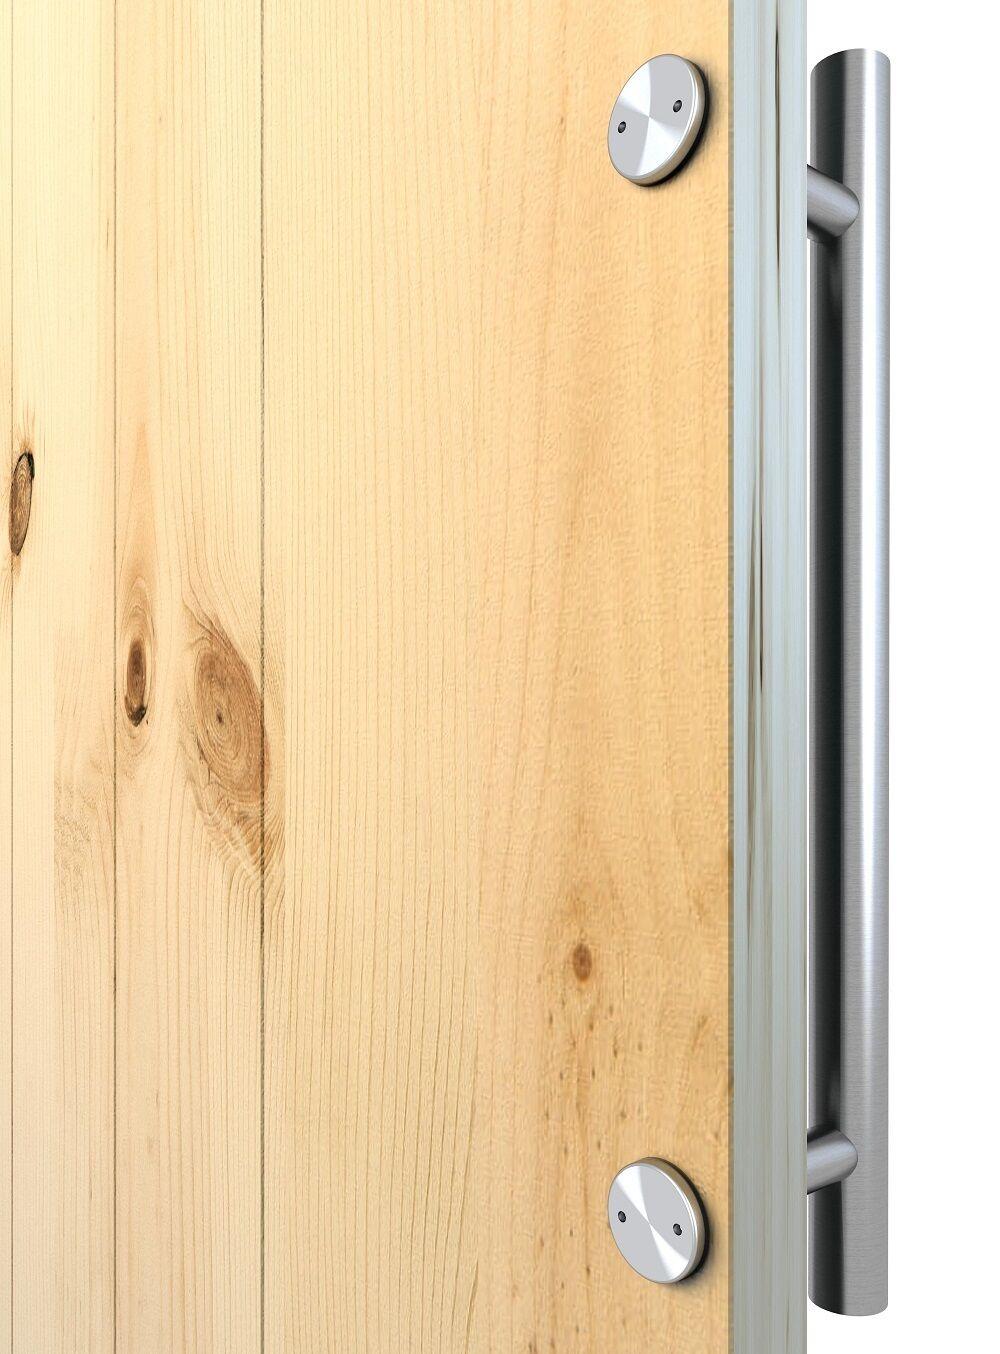 Furniture Drawer Door Cabinet Closet Wood Round Knob Pull Handle 50pcs N3K5